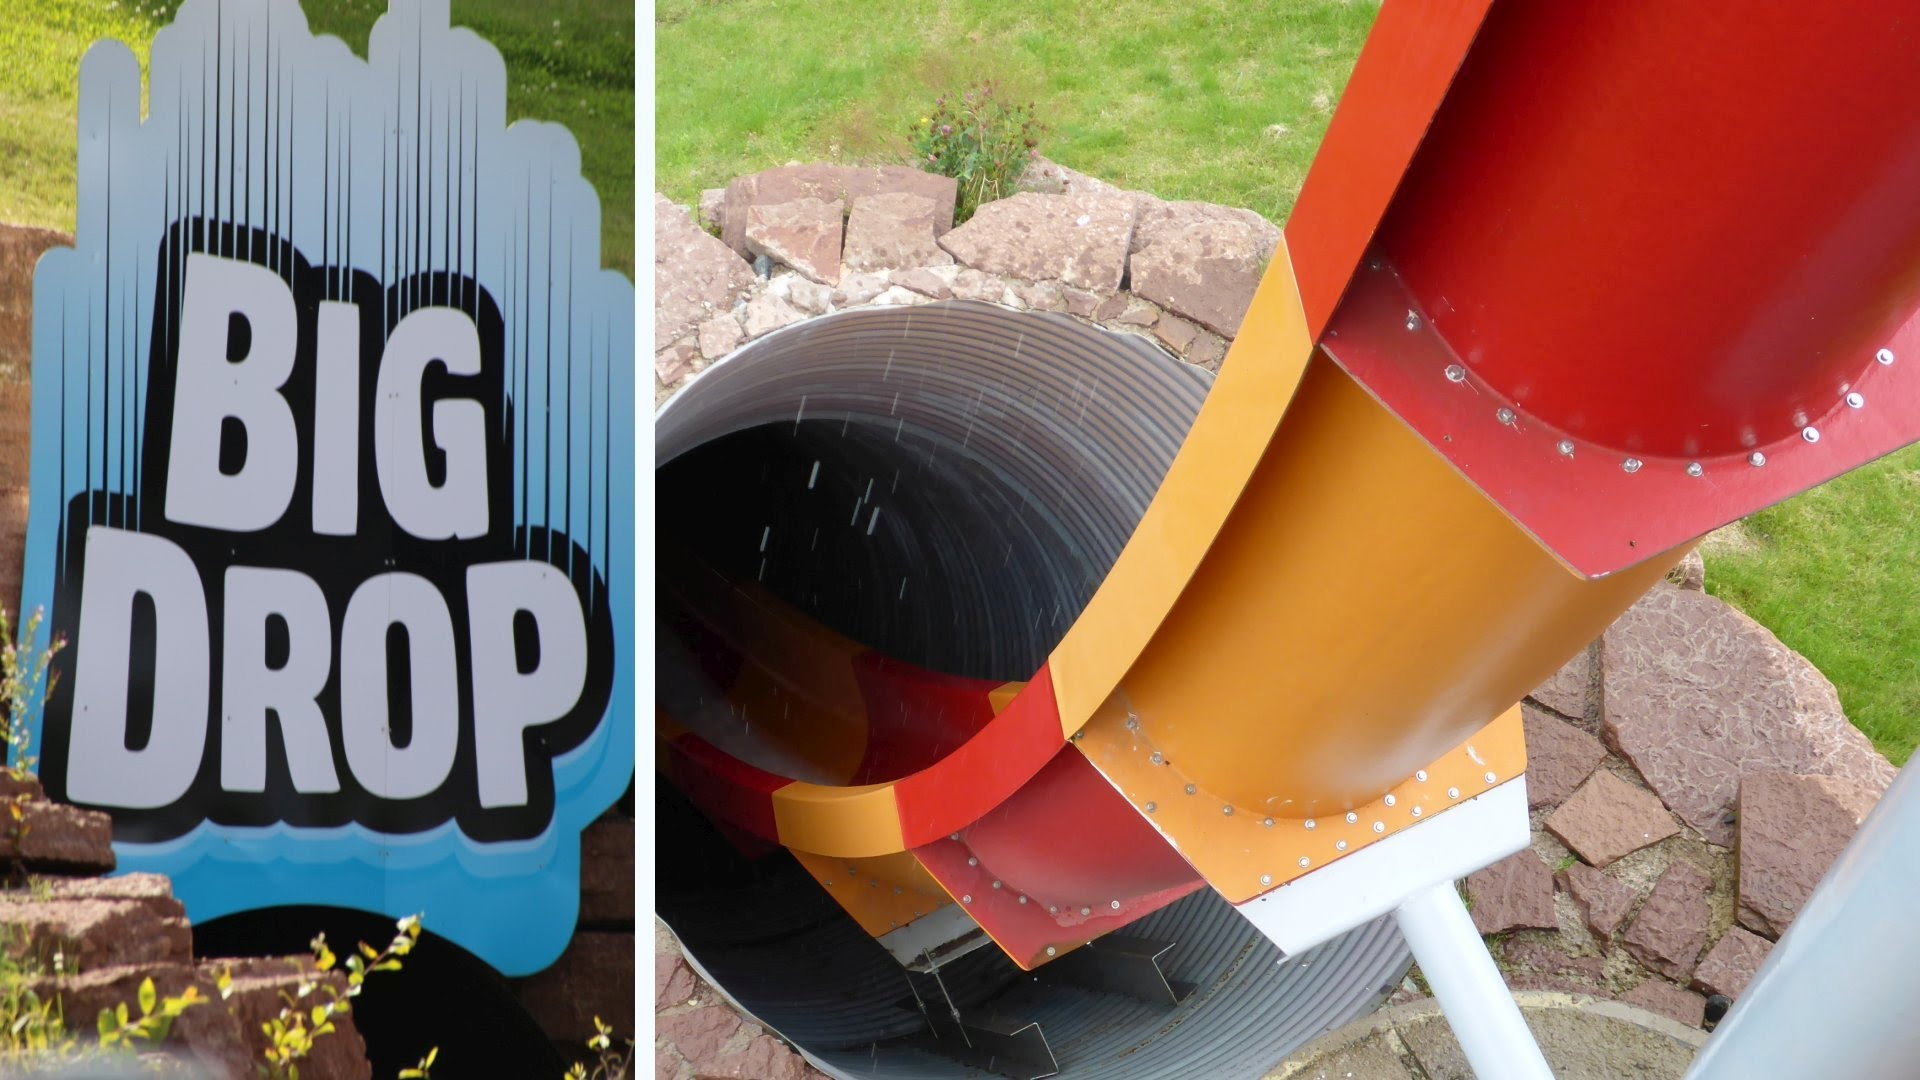 Big Drop - Kamikaze-Rutsche :: Free Fall Slide   Skara Sommarland